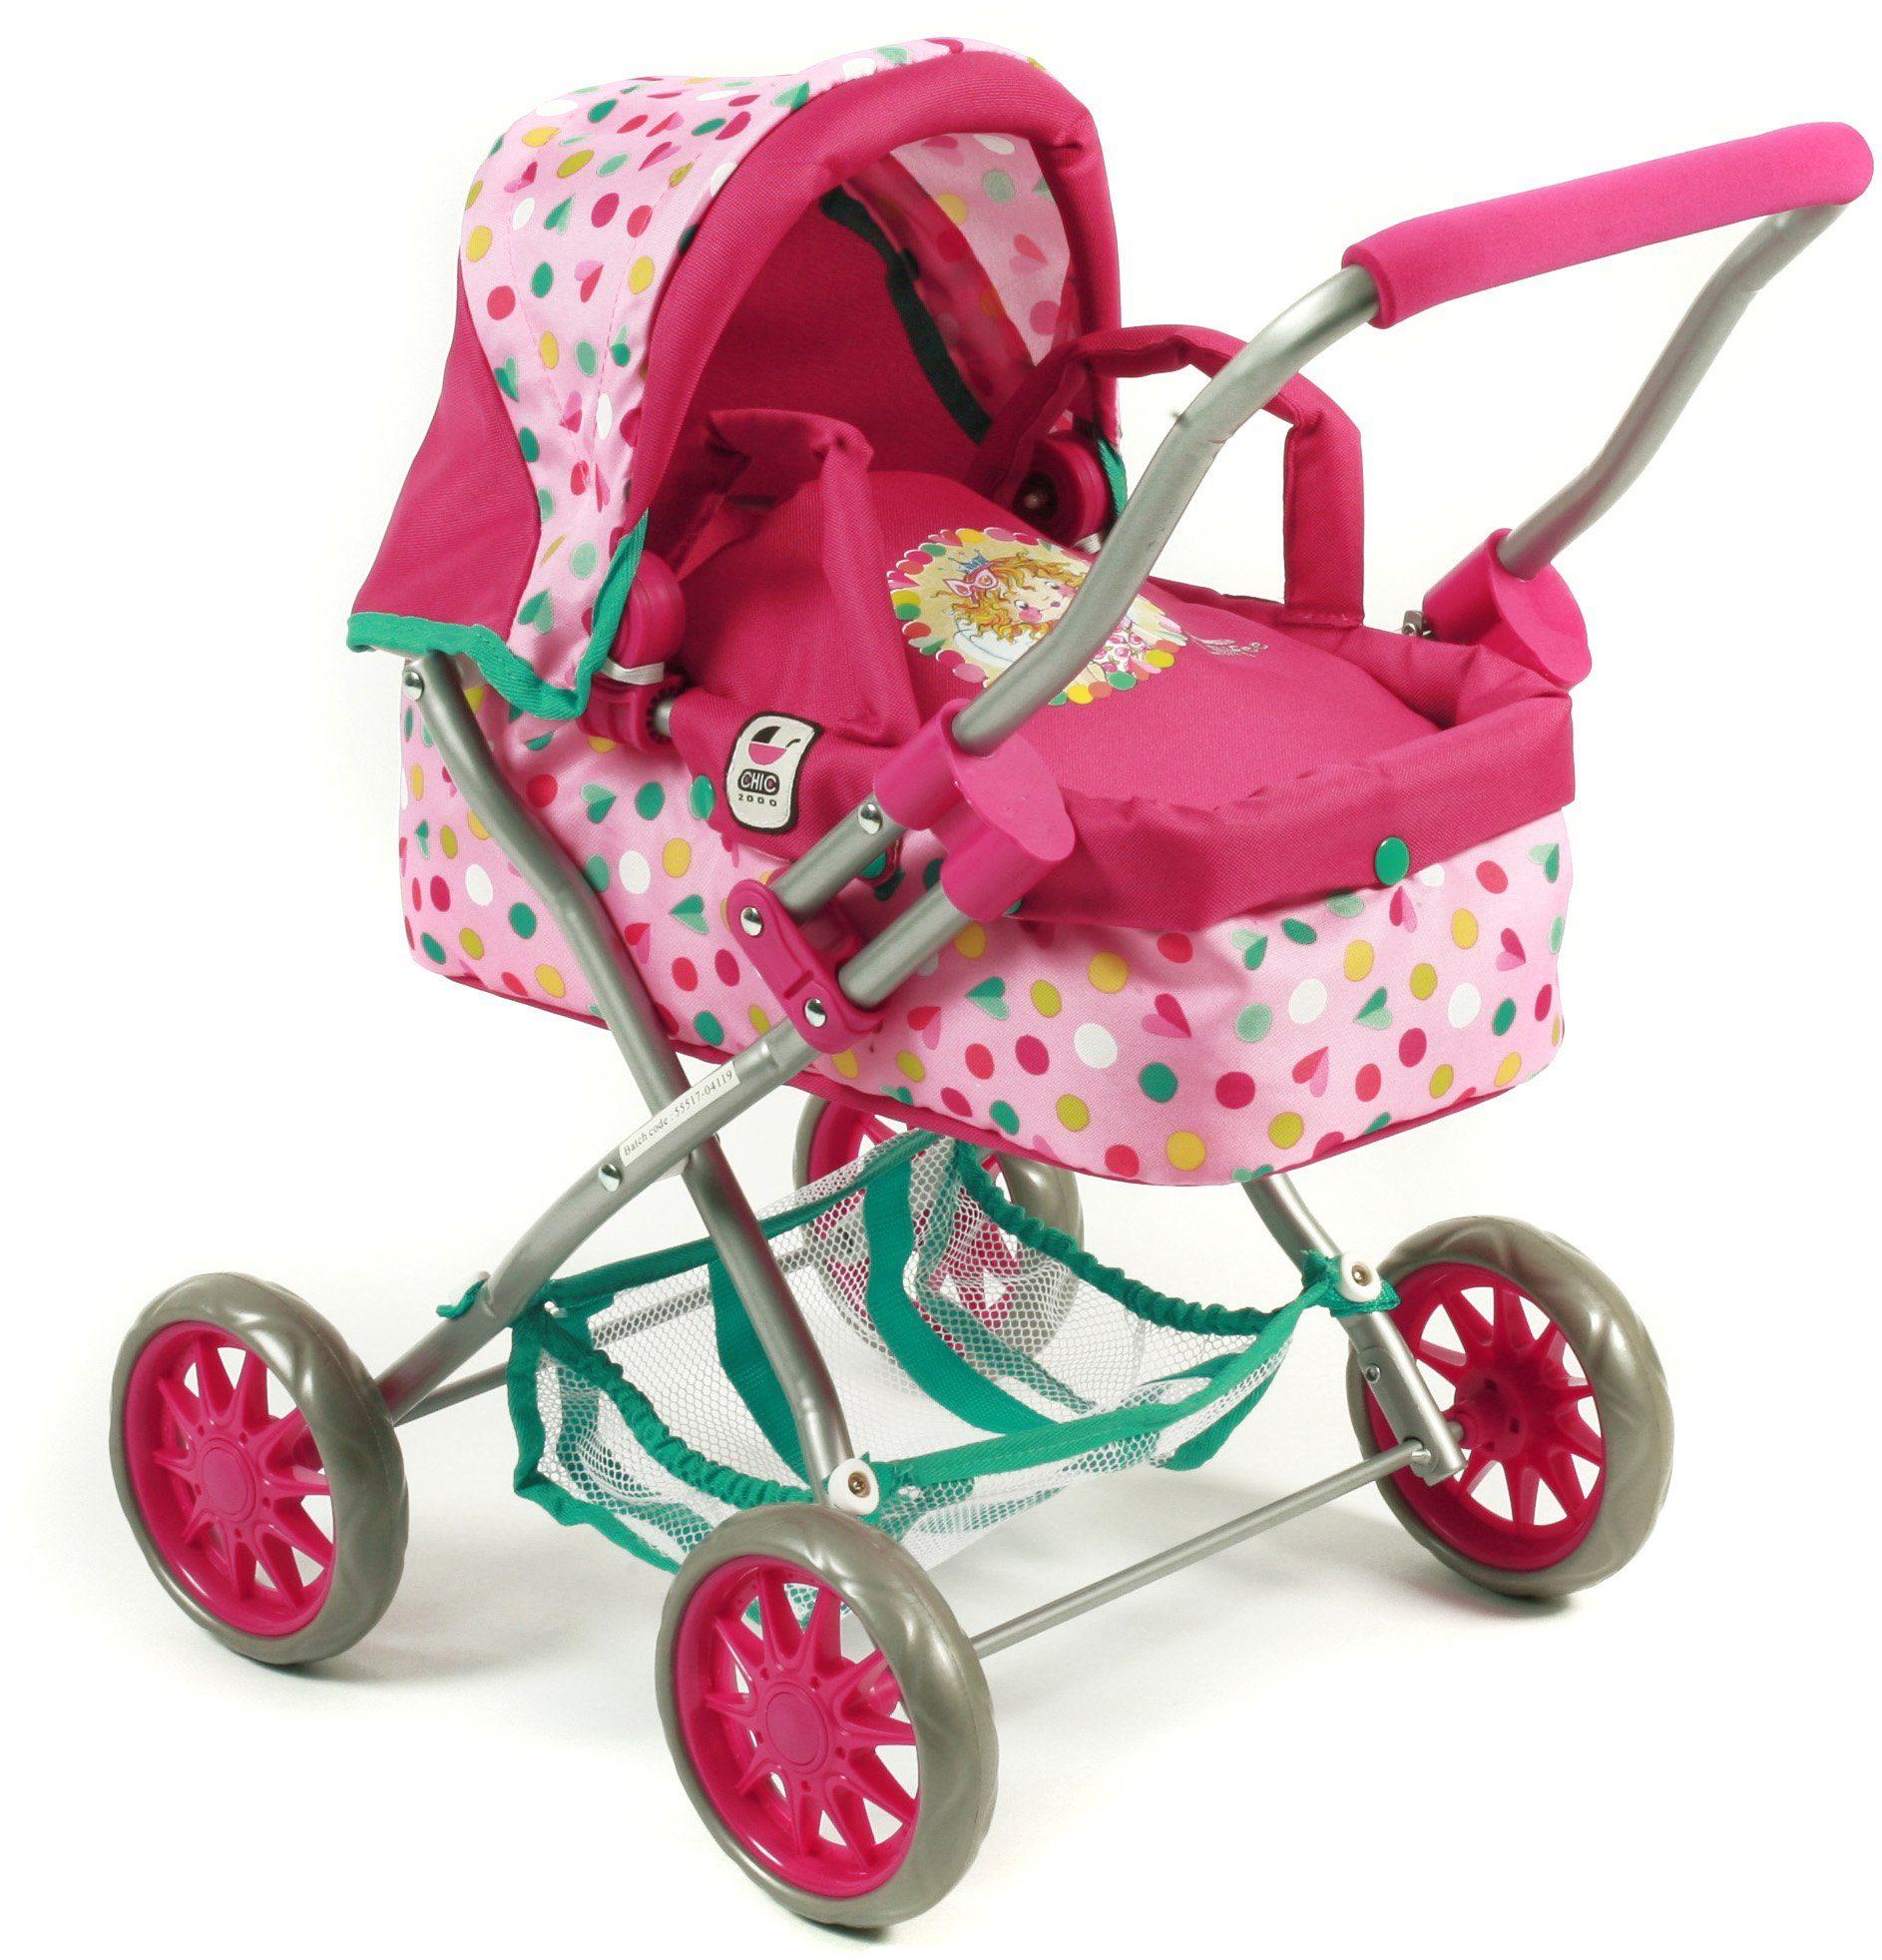 CHIC2000 Mini Puppenwagen mit herausnehmbarer Tragetasche, »Smarty Lillifee«